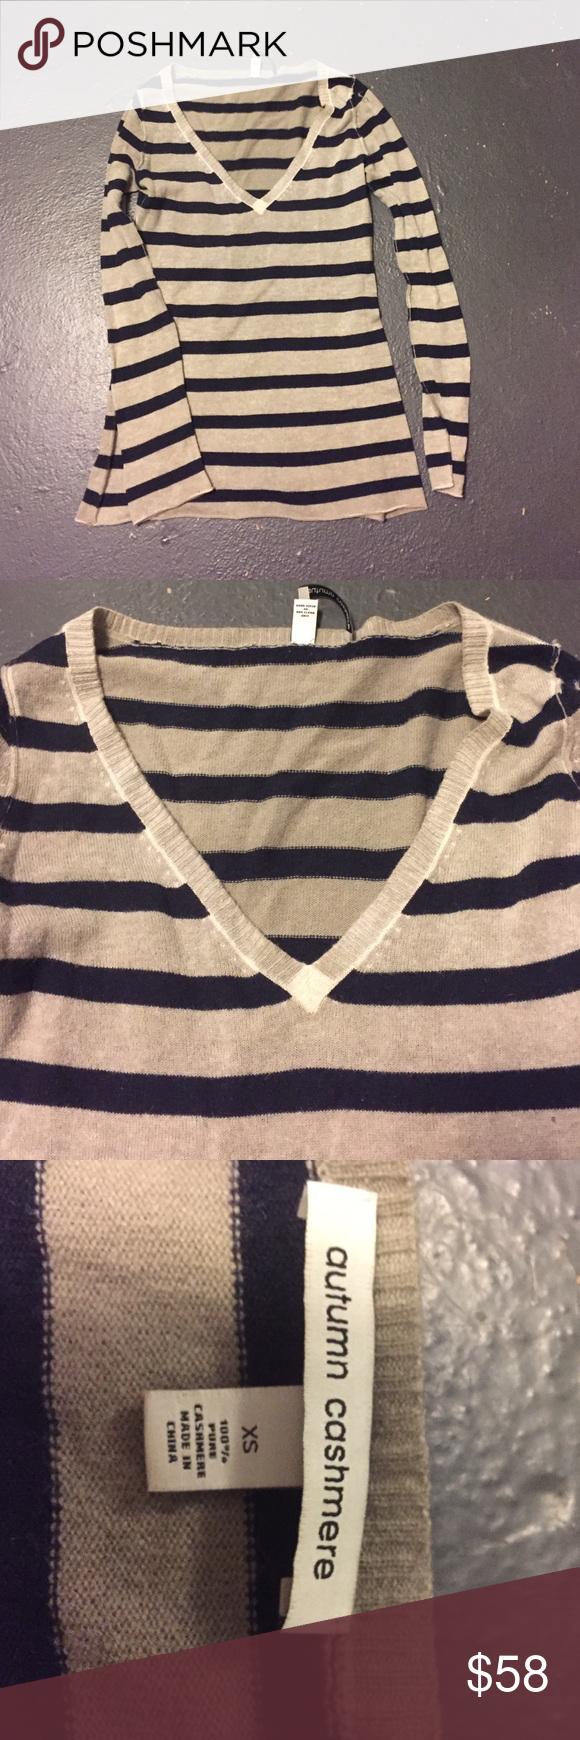 Autumn cashmere extra small 100% cashmere | Sweaters, Cashmere ...